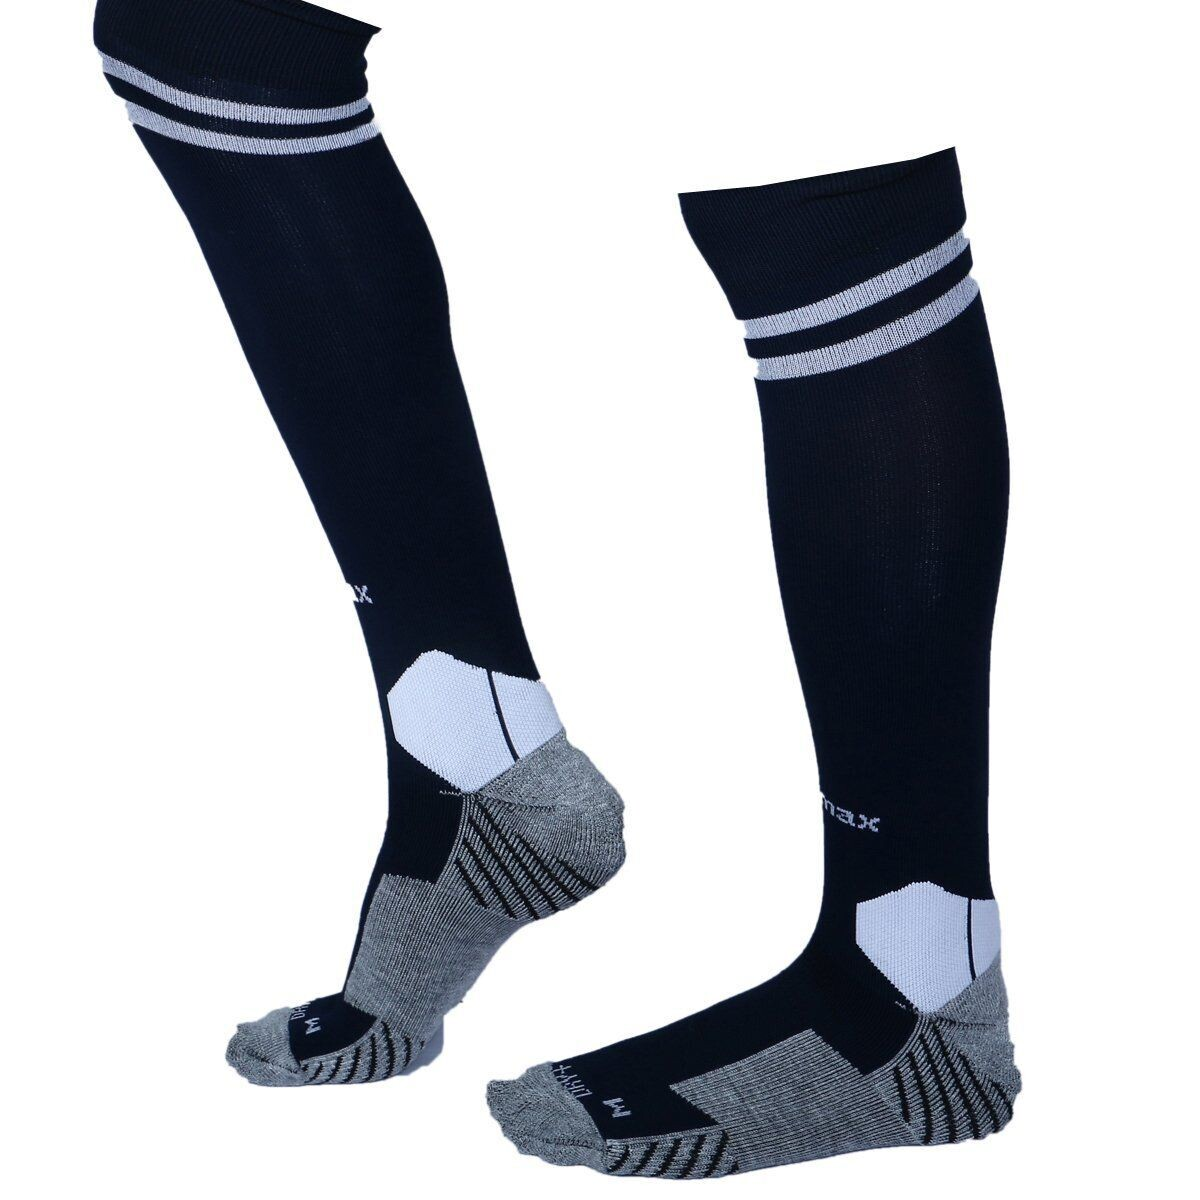 Willmax Football Stockings